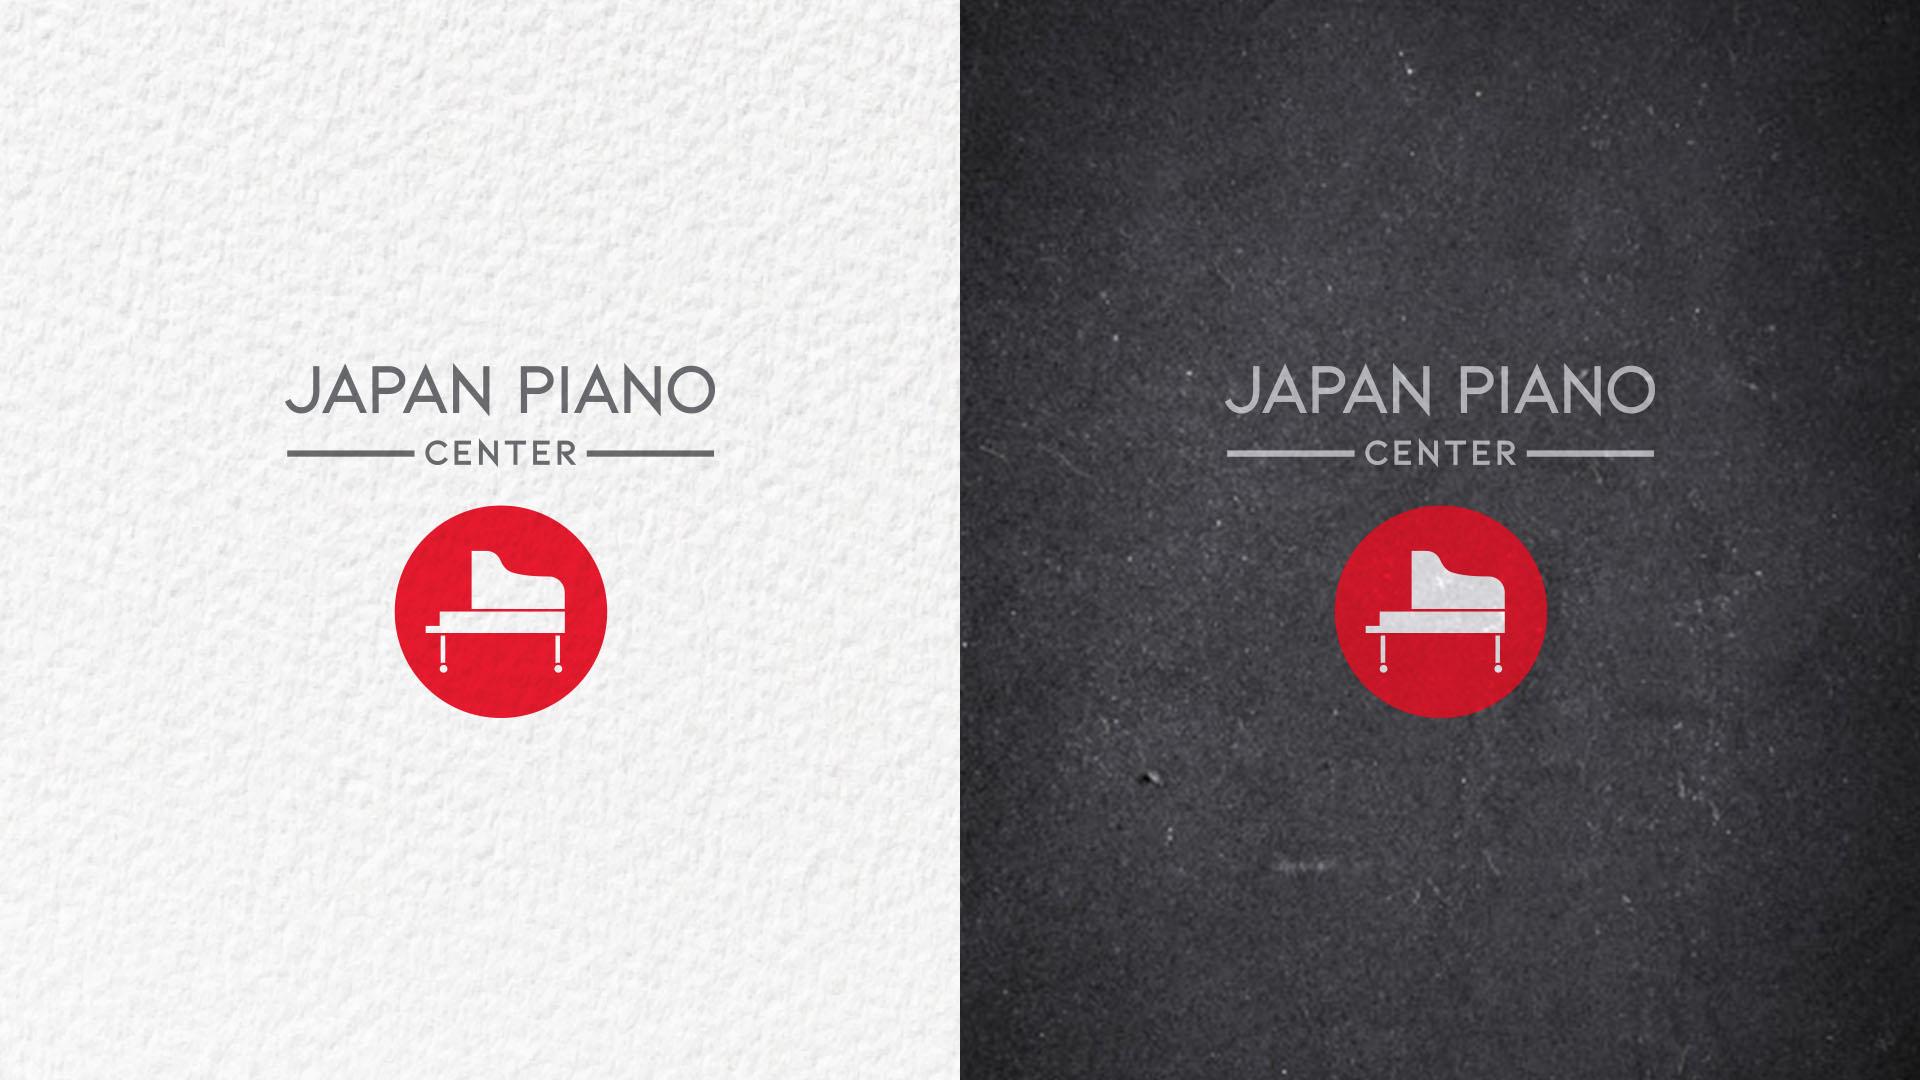 JAPAN PIANO CENTER_1